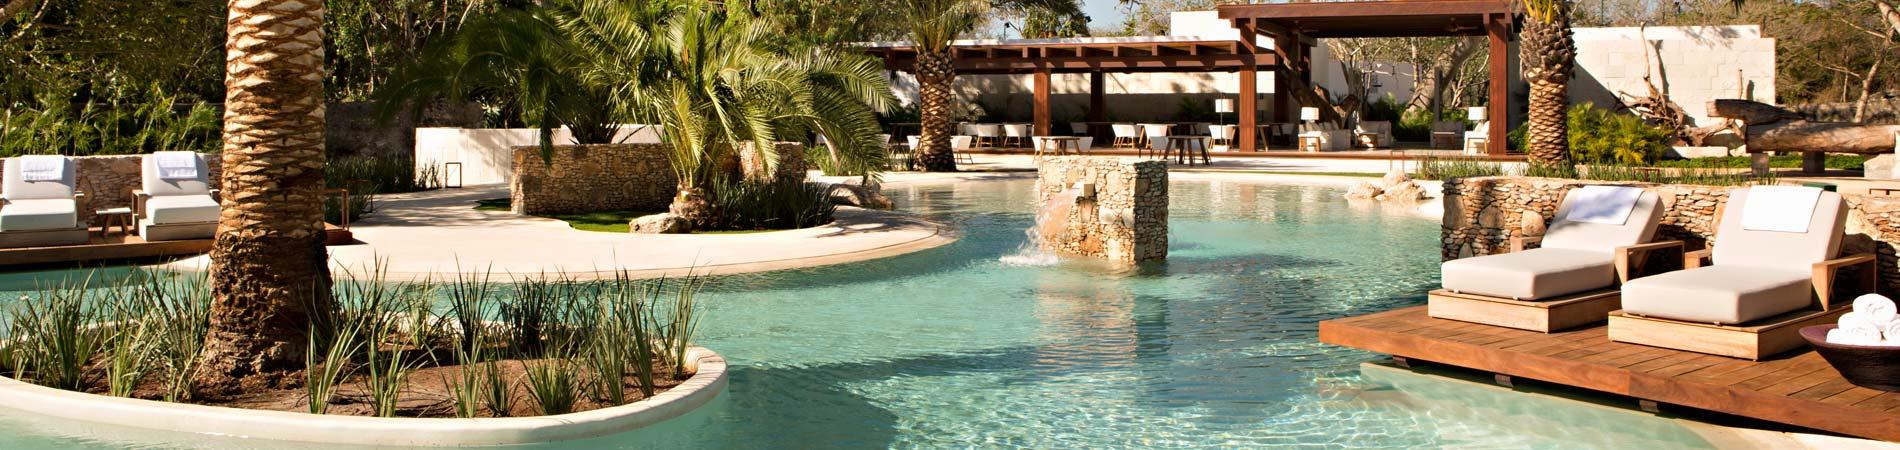 Chabl 233 Resort Amp Spa Merida Yucatan Journey Mexico